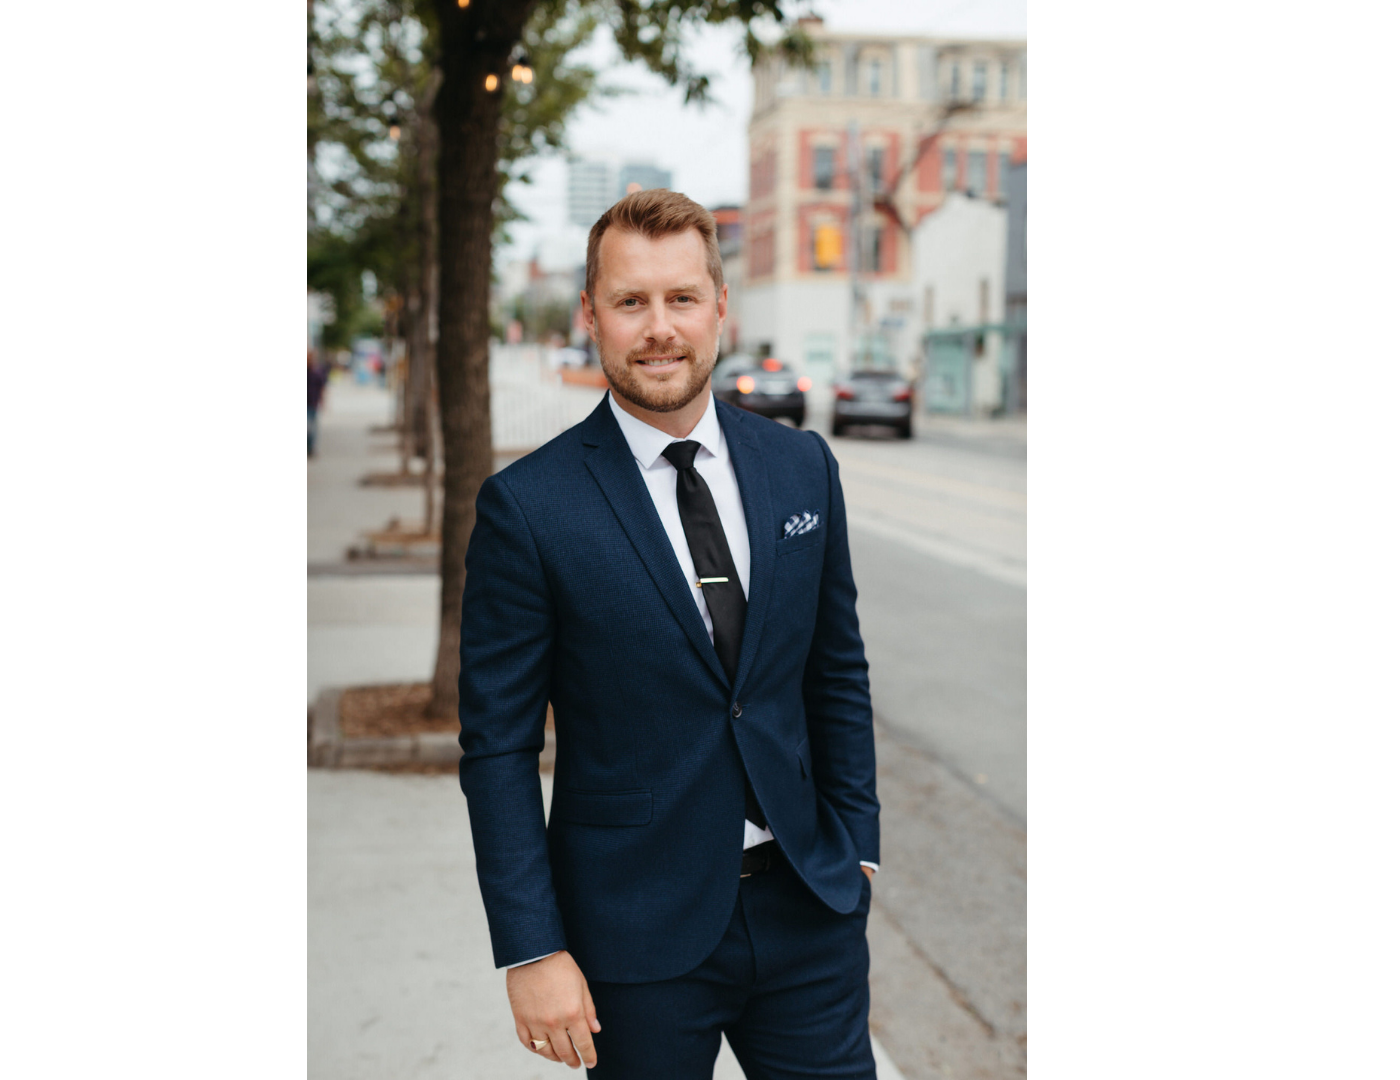 Kyle Bridson Realtor Team Lead BRG Berkshire Hathaway Homeservices Queen West Toronto